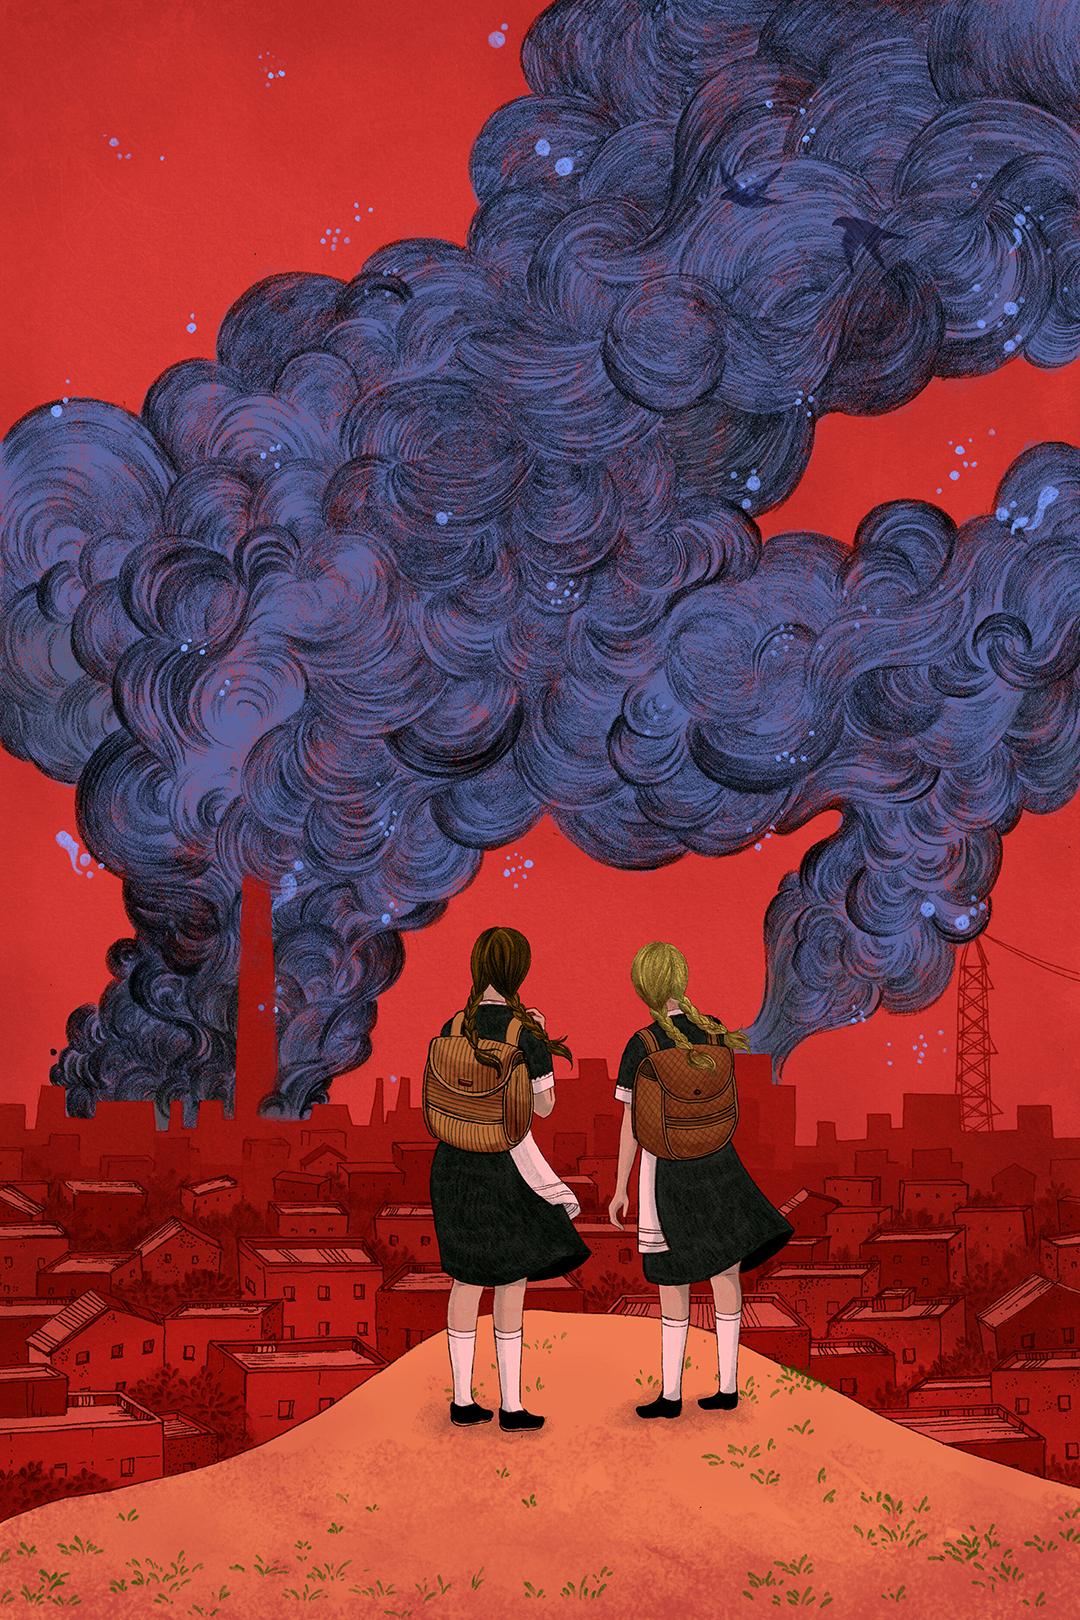 GirlsclubAsia-Illustrator-Shreya-Gupta-NewYork-India-Blackbird+Girls-+Viking+Books